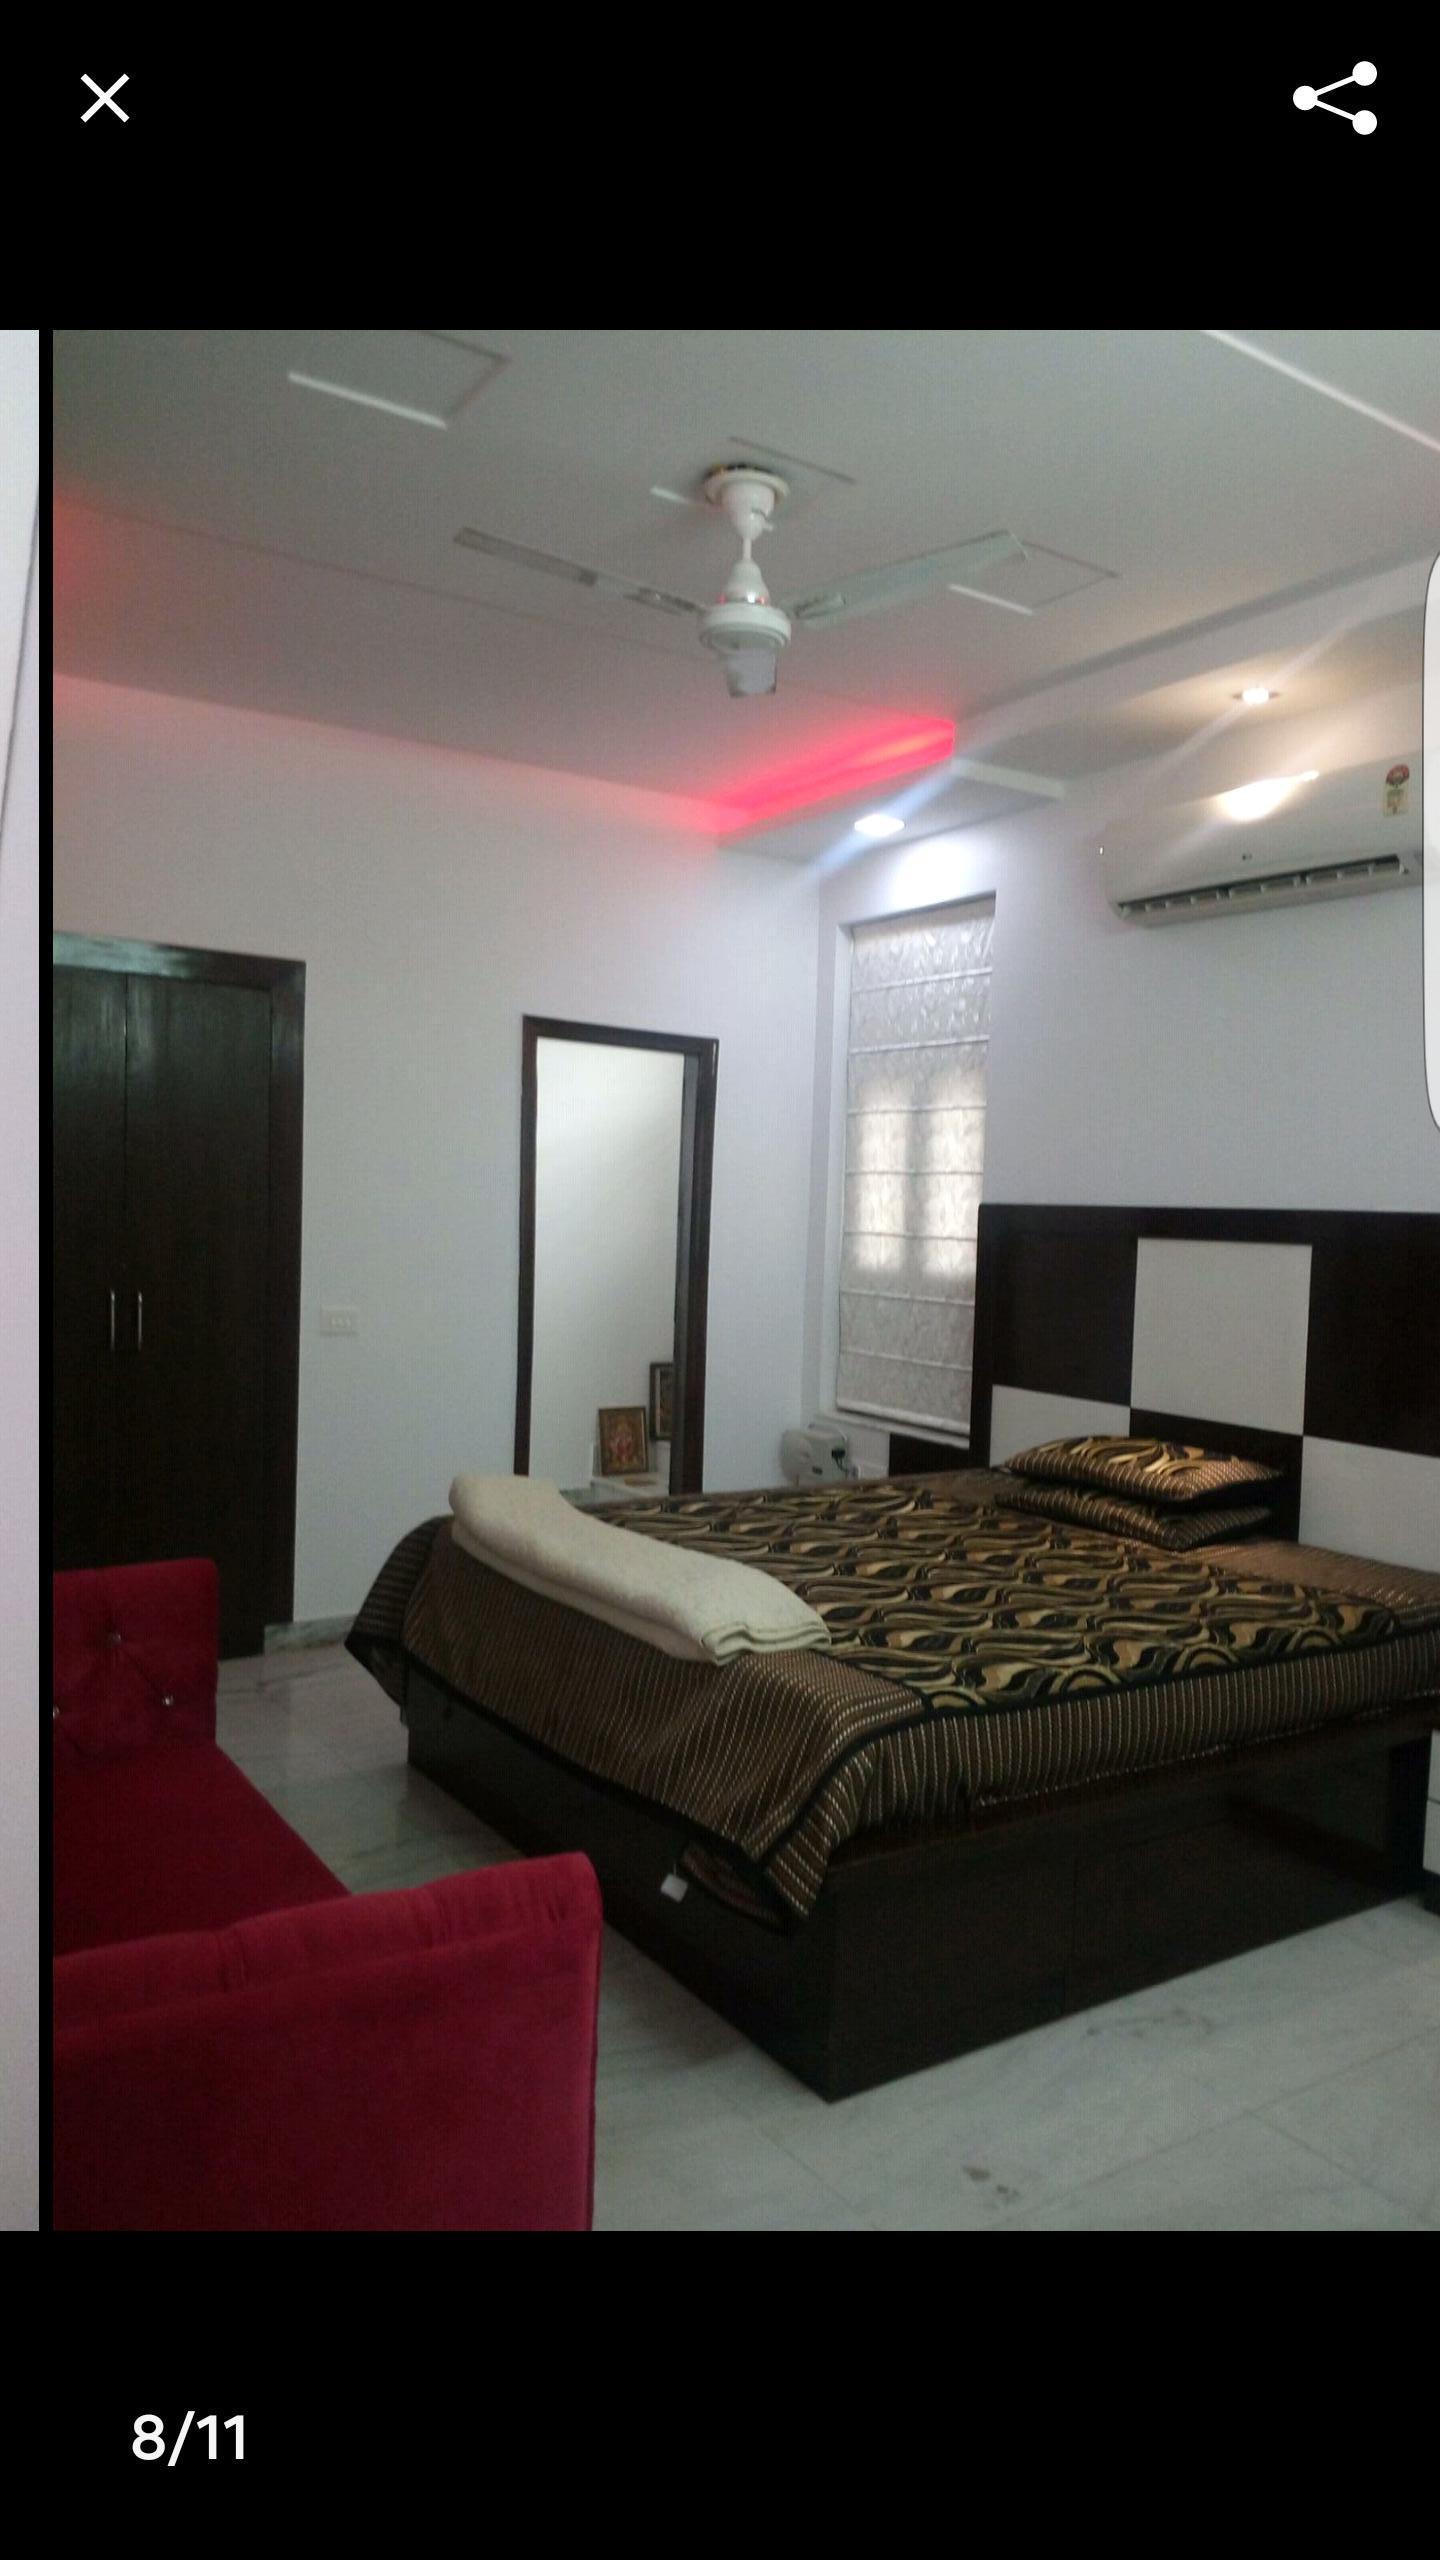 3 Bhk moderne Wohnung im Sektor 17 Faridabad